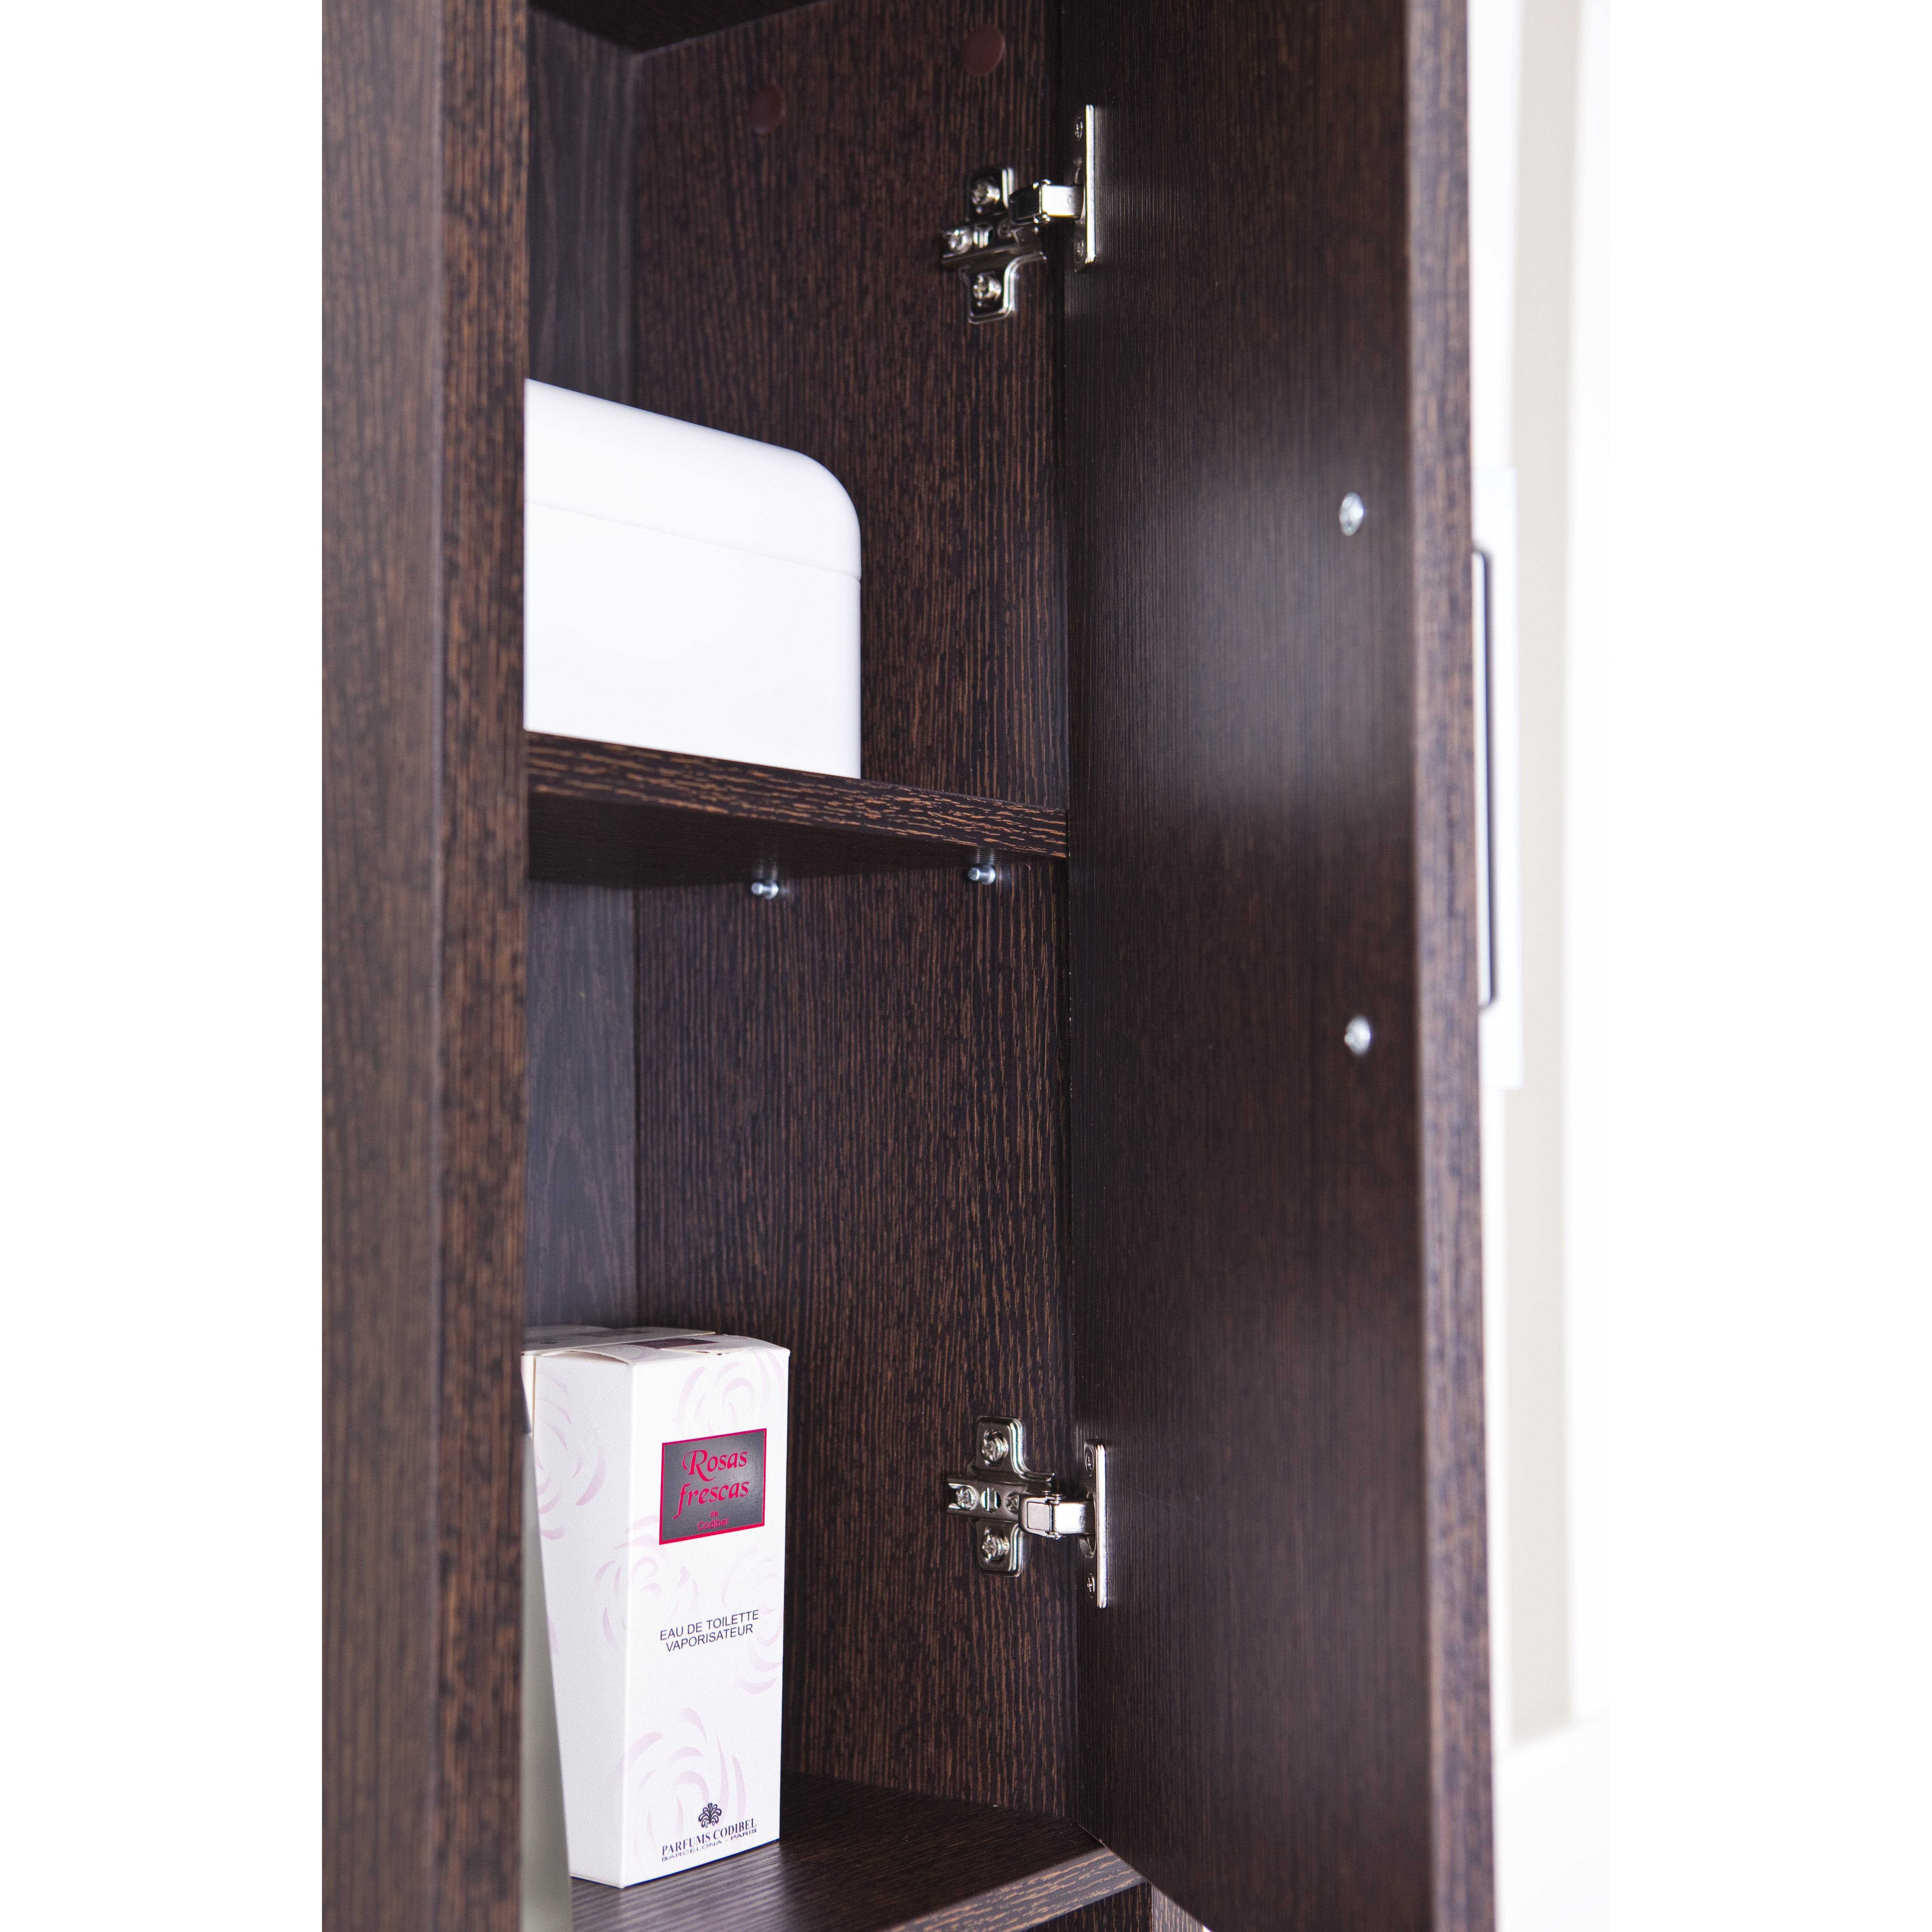 Hokku Designs Galveston 34 x 194cm Free Standing Tall Bathroom Cabinet